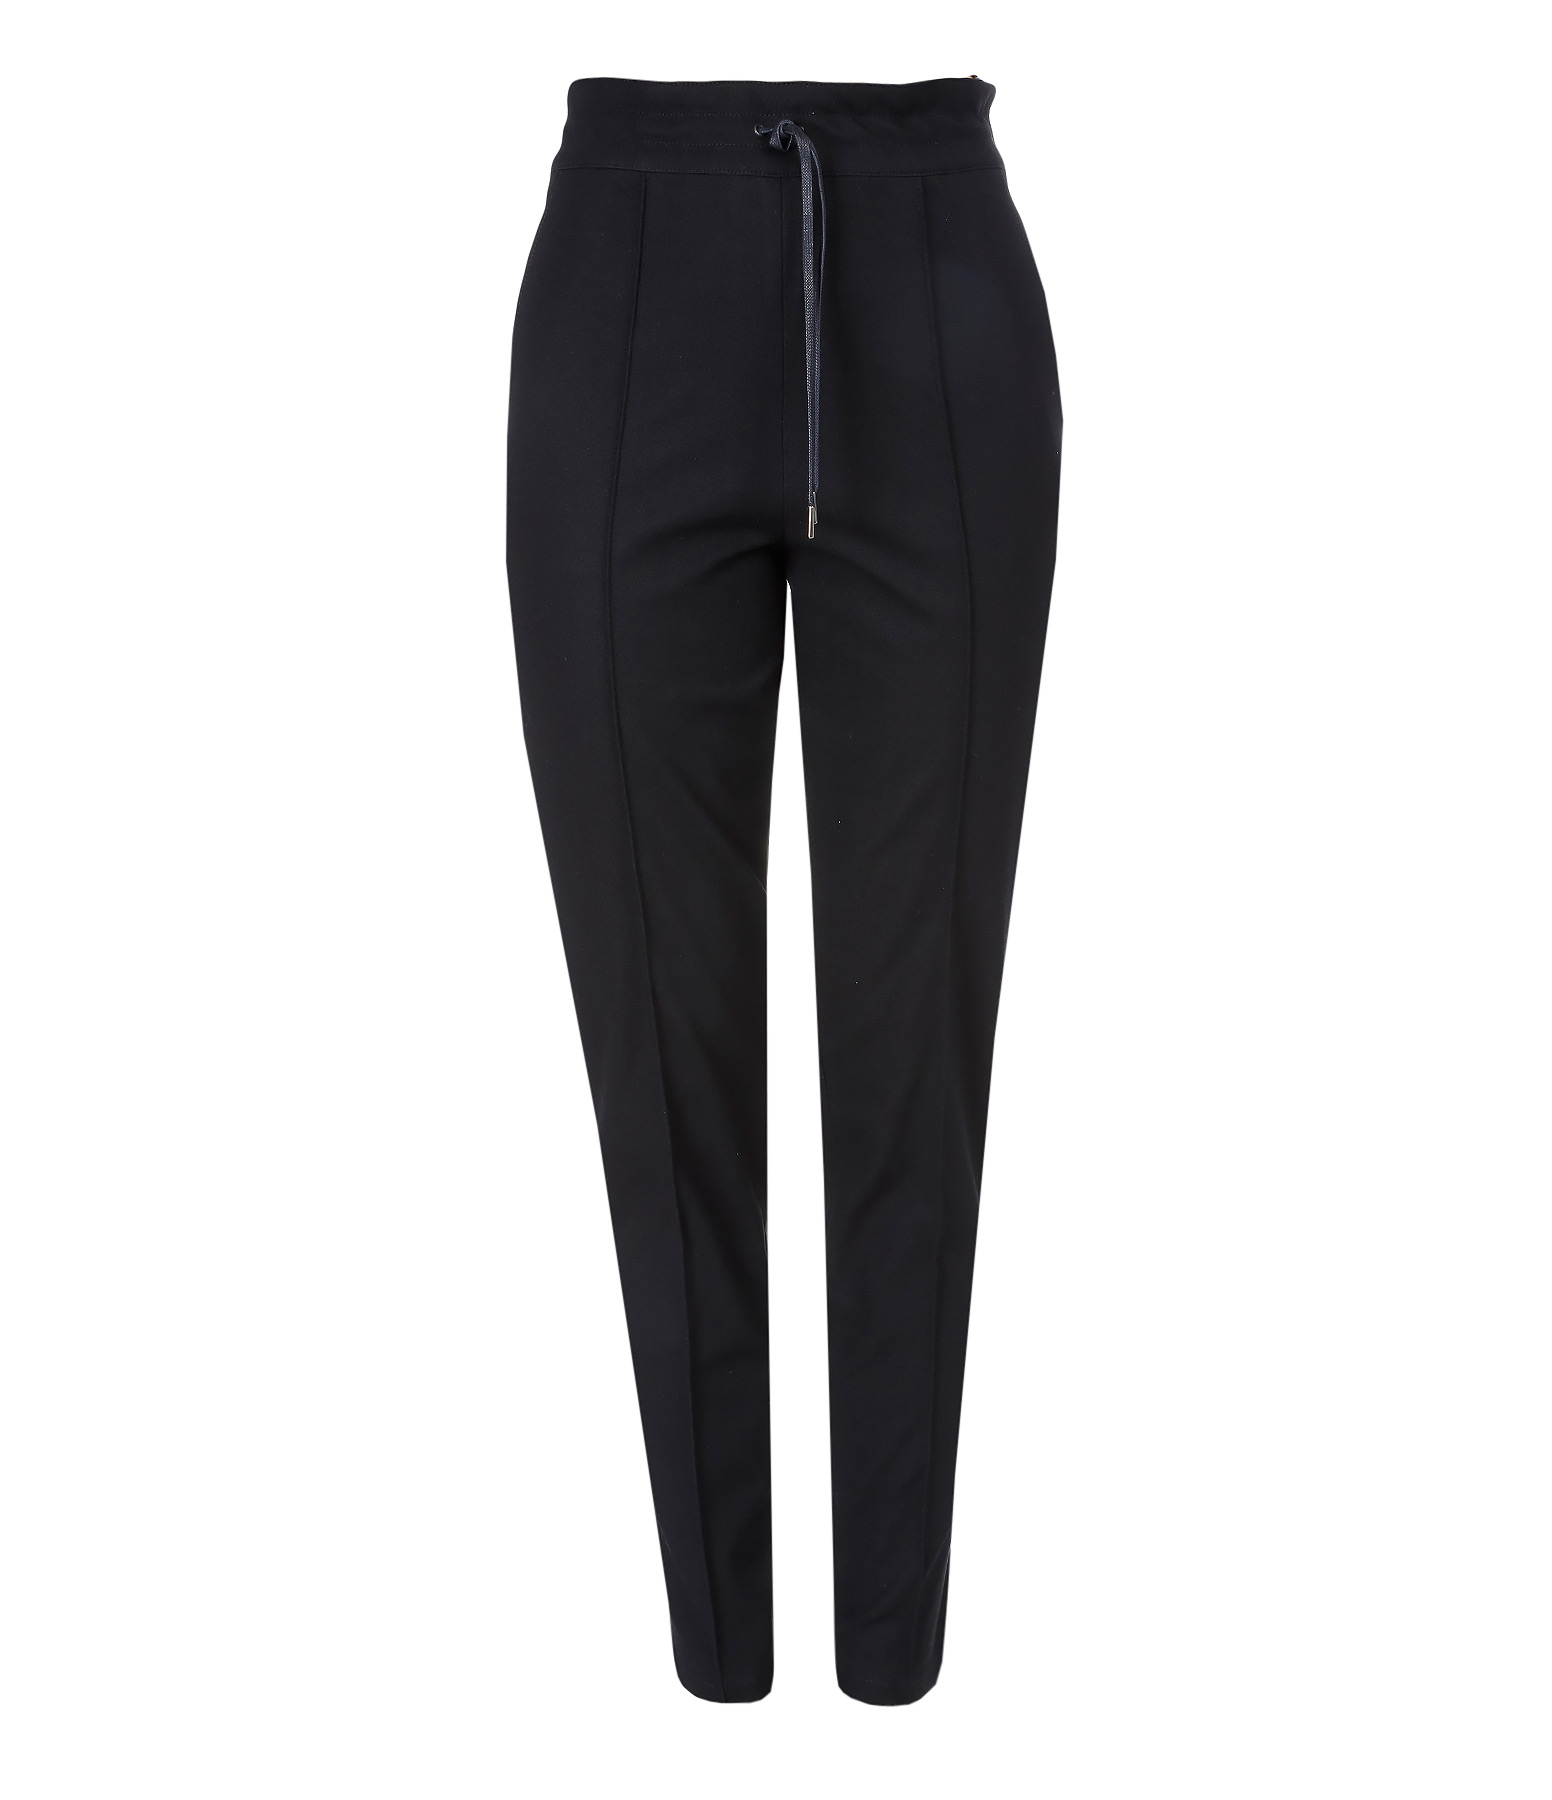 Pantalon Base Tuxedo Coton Noir Blanc